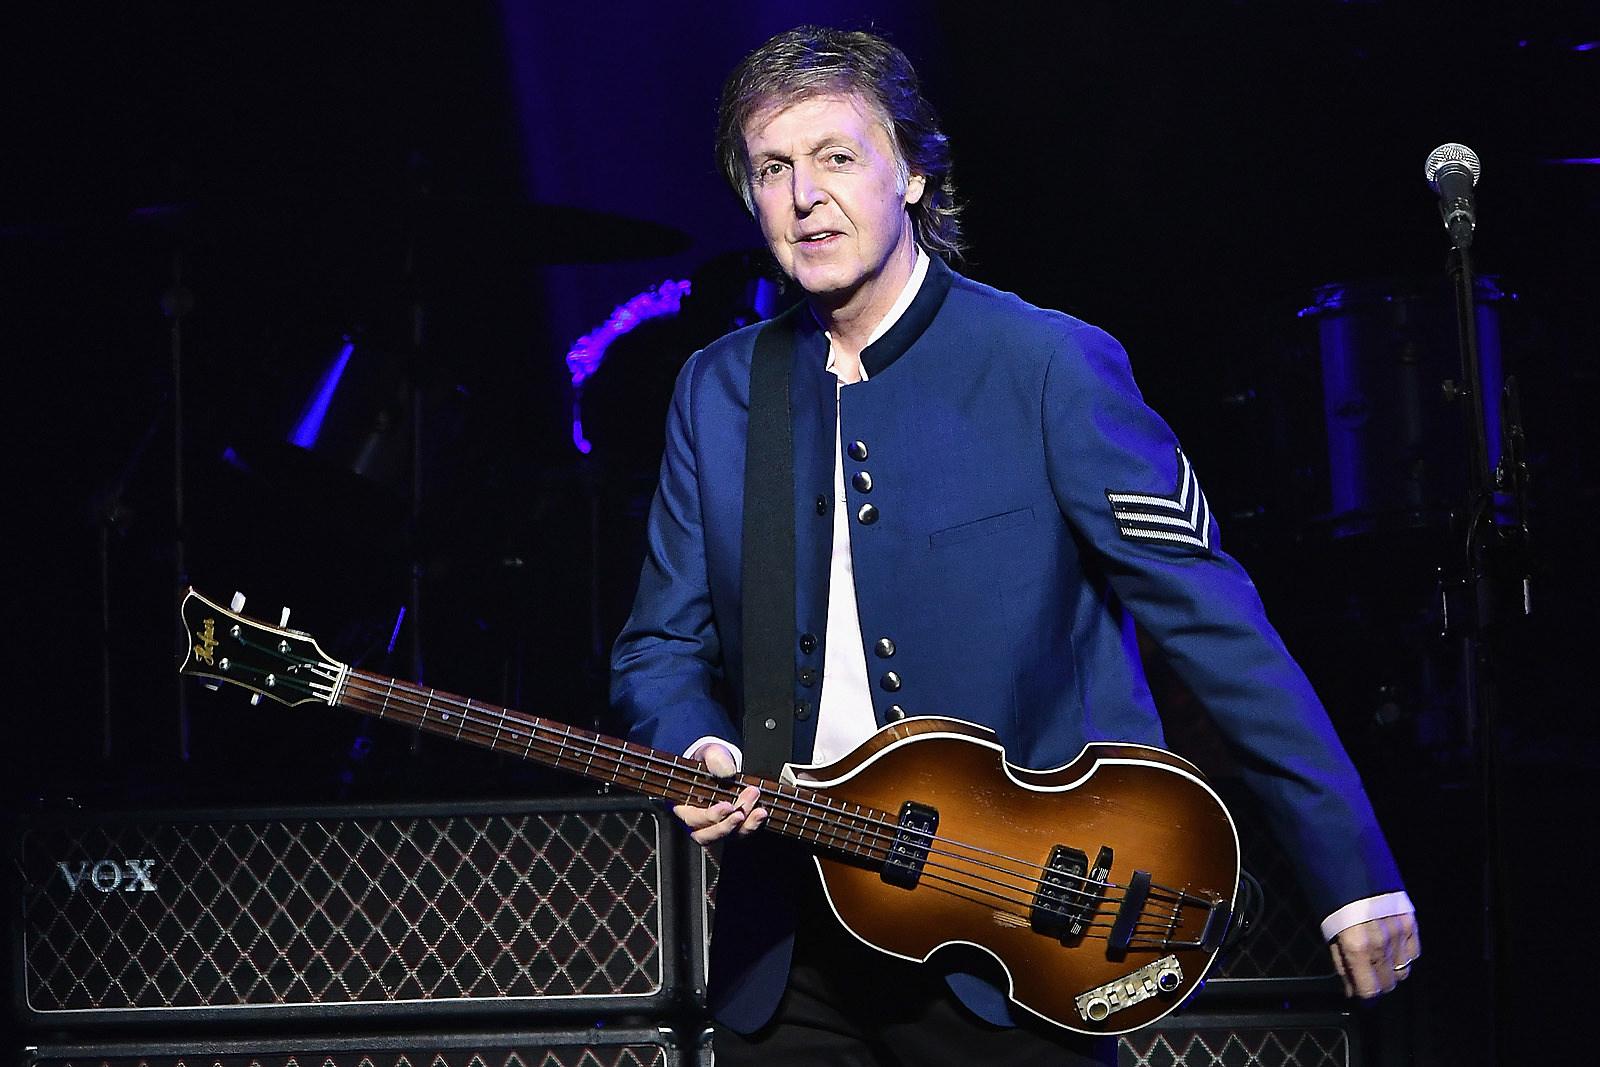 Paul McCartney Considers Album Made From Band Improvisations